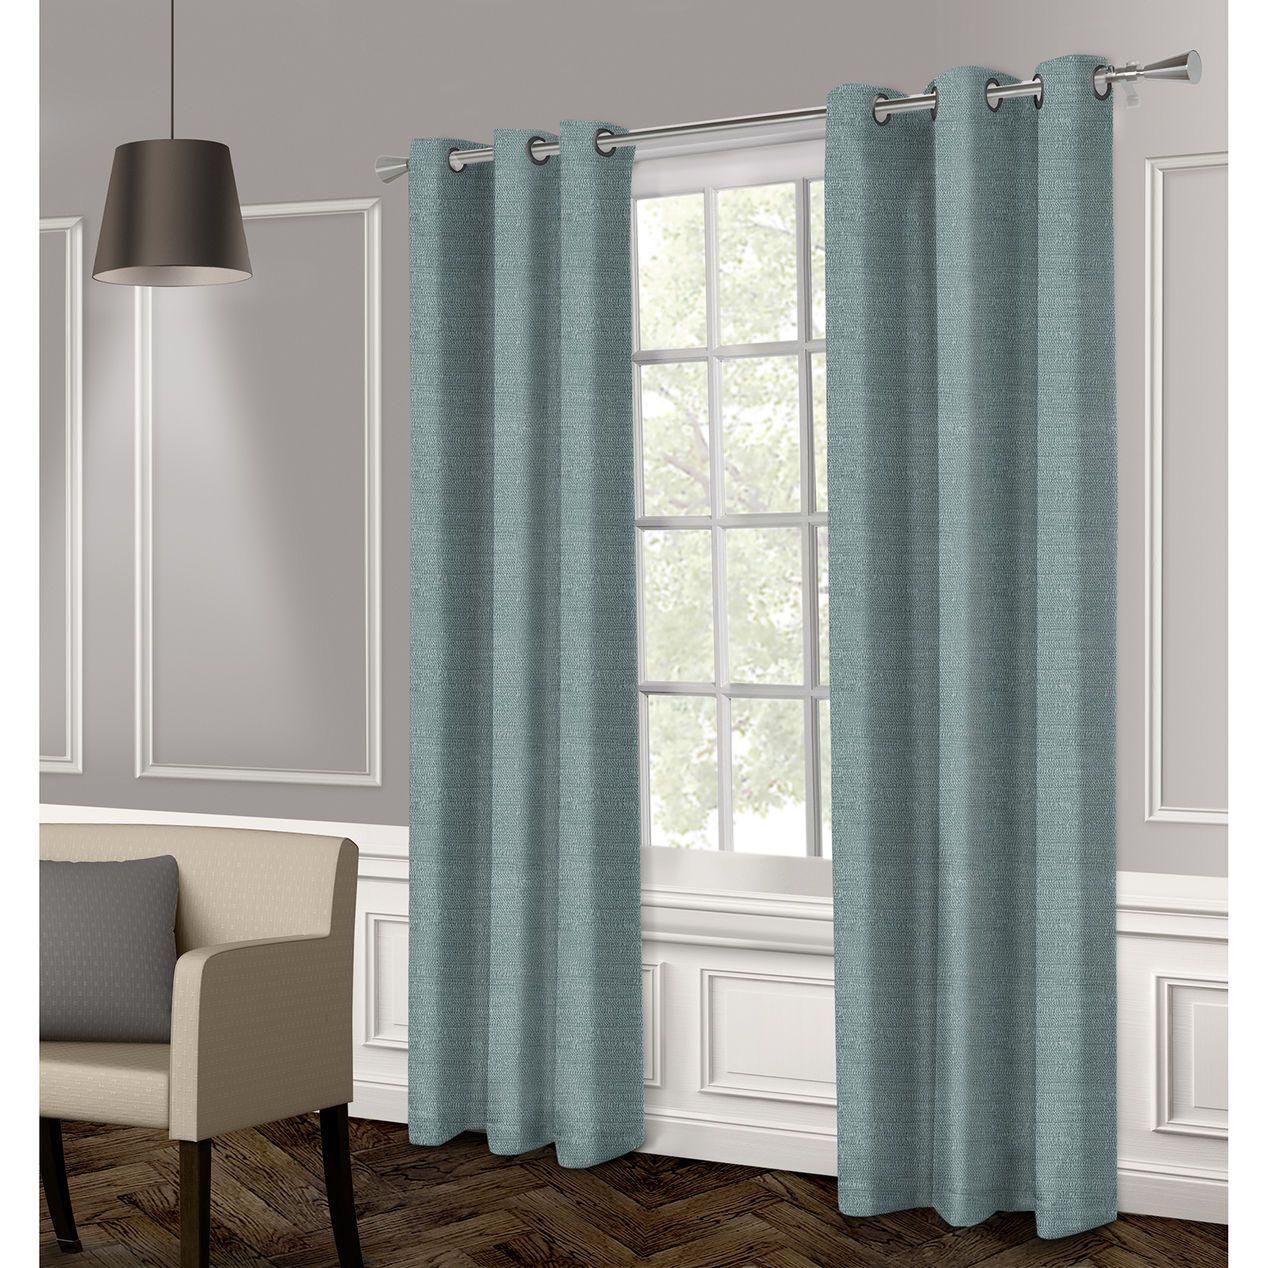 Raw Silk Textured Grommet Curtain Panel- Blue 96-in